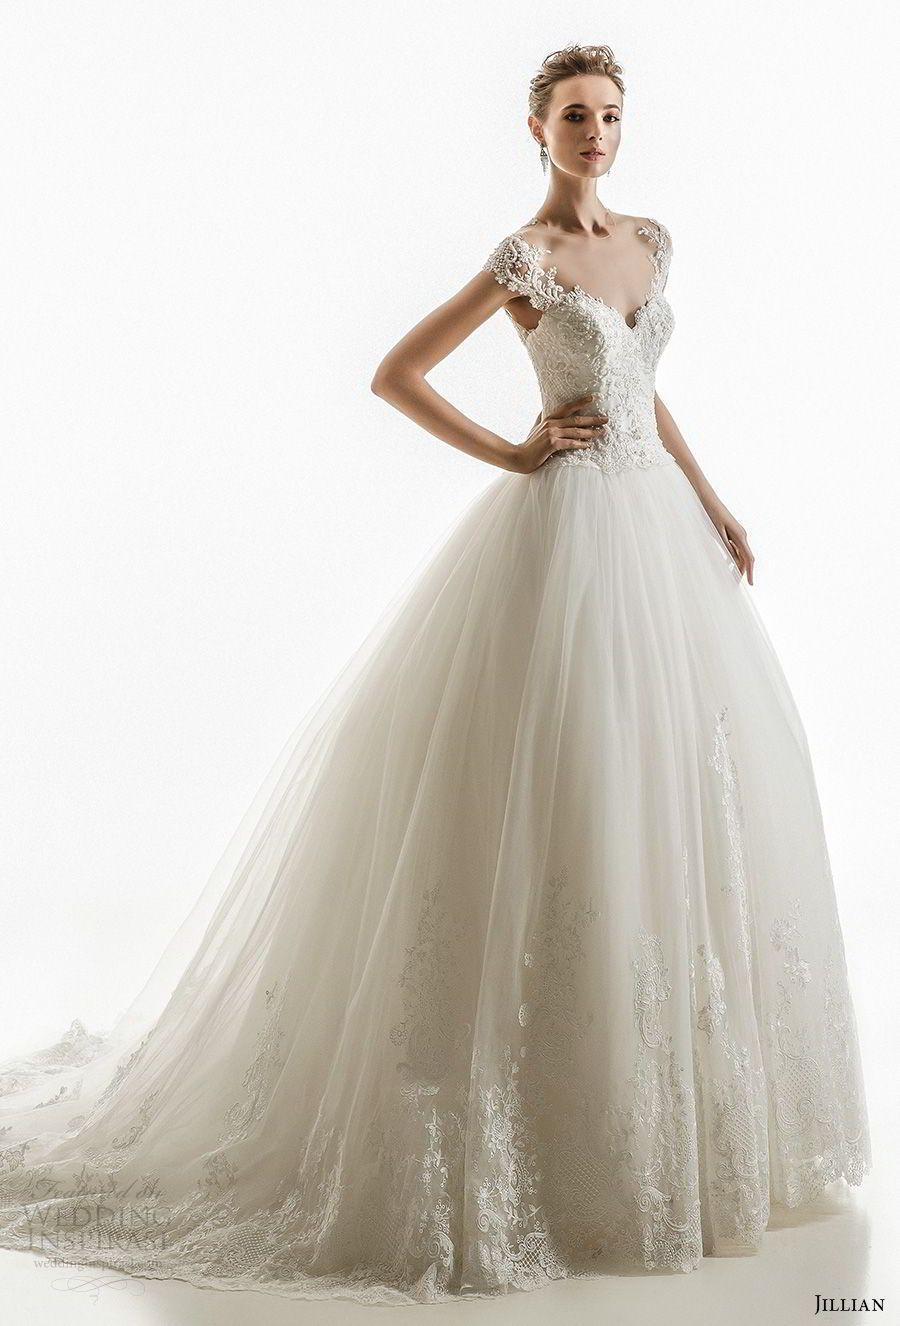 d63512c2504 jillian 2018 bridal cap sleeves illusion jewel sweetheart neckline heavily  embellished princess ball gown wedding dress sheer lace back chapel train  (17) mv ...